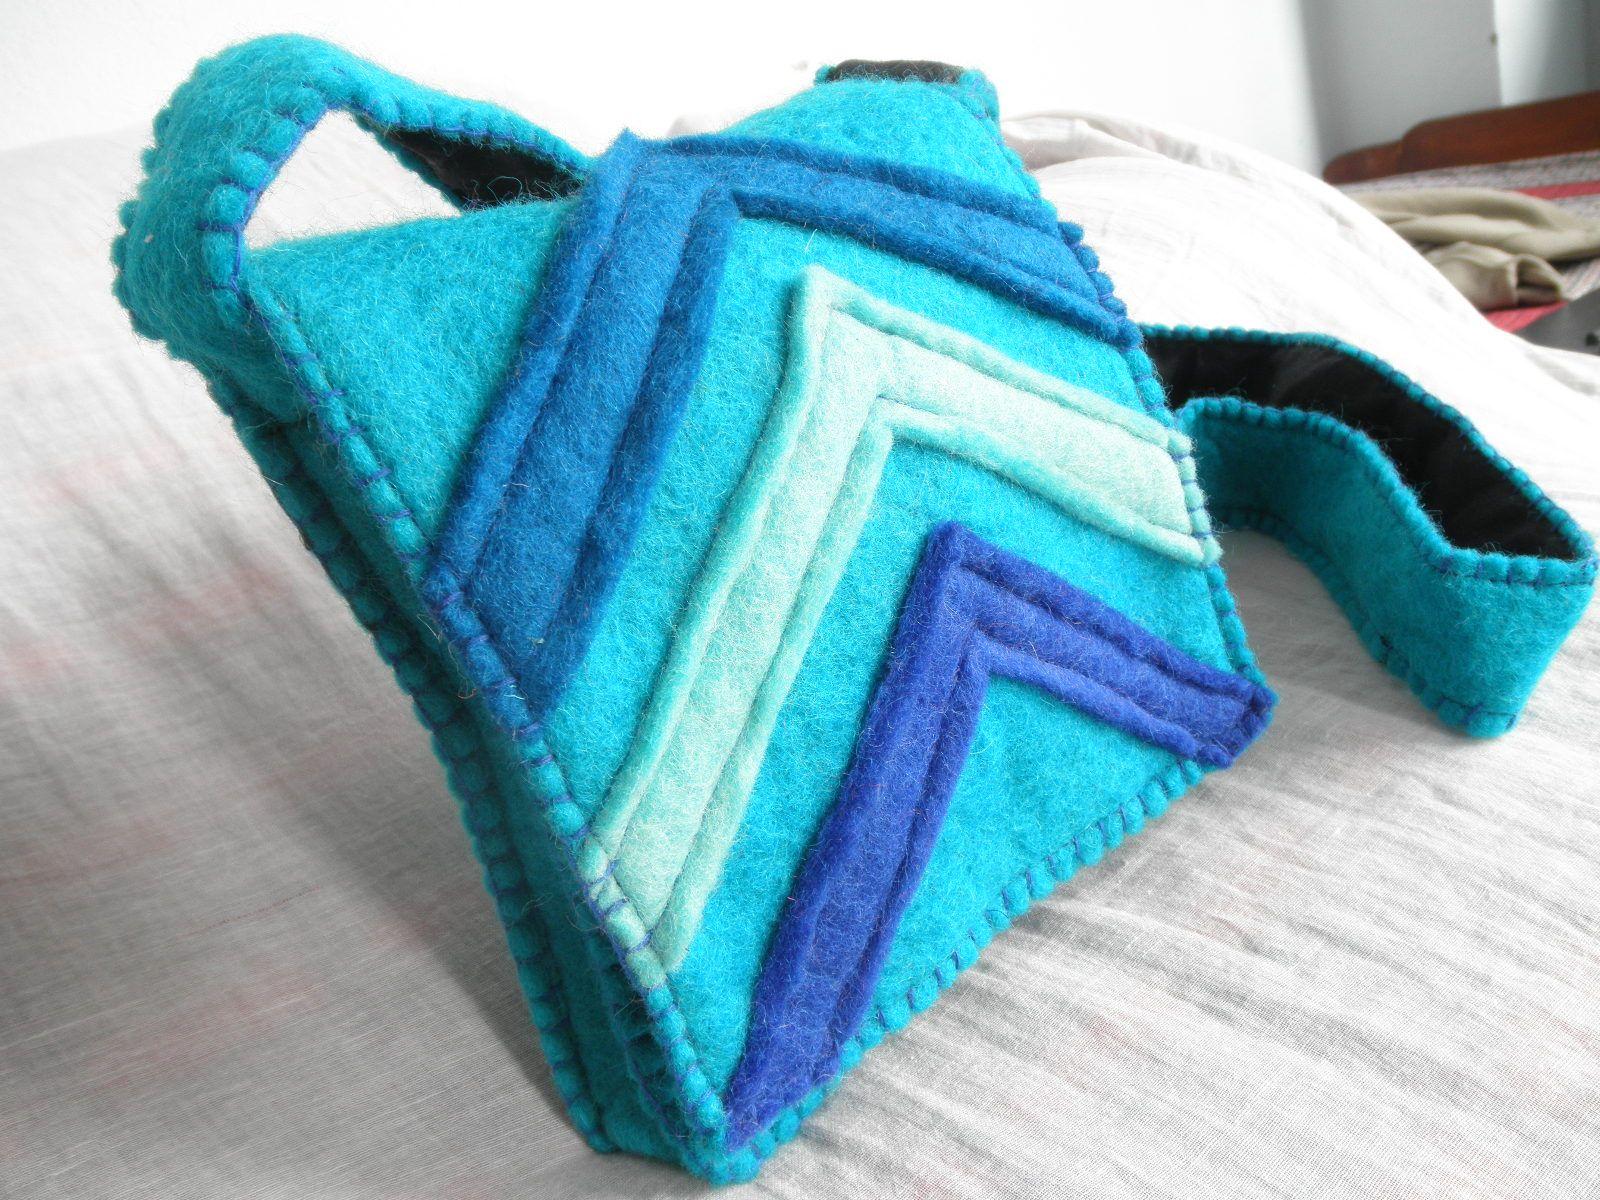 Wool Craft Ideas For Kids Part - 40: Felt Wool DIY U0026 Crafts Felt Wool Craft Handicraft Felt Craft Supplies Felt  Craft Design Felt Craft Patterns Felt Craft Ideas Felt Craft For Kids Felt  Craft ...